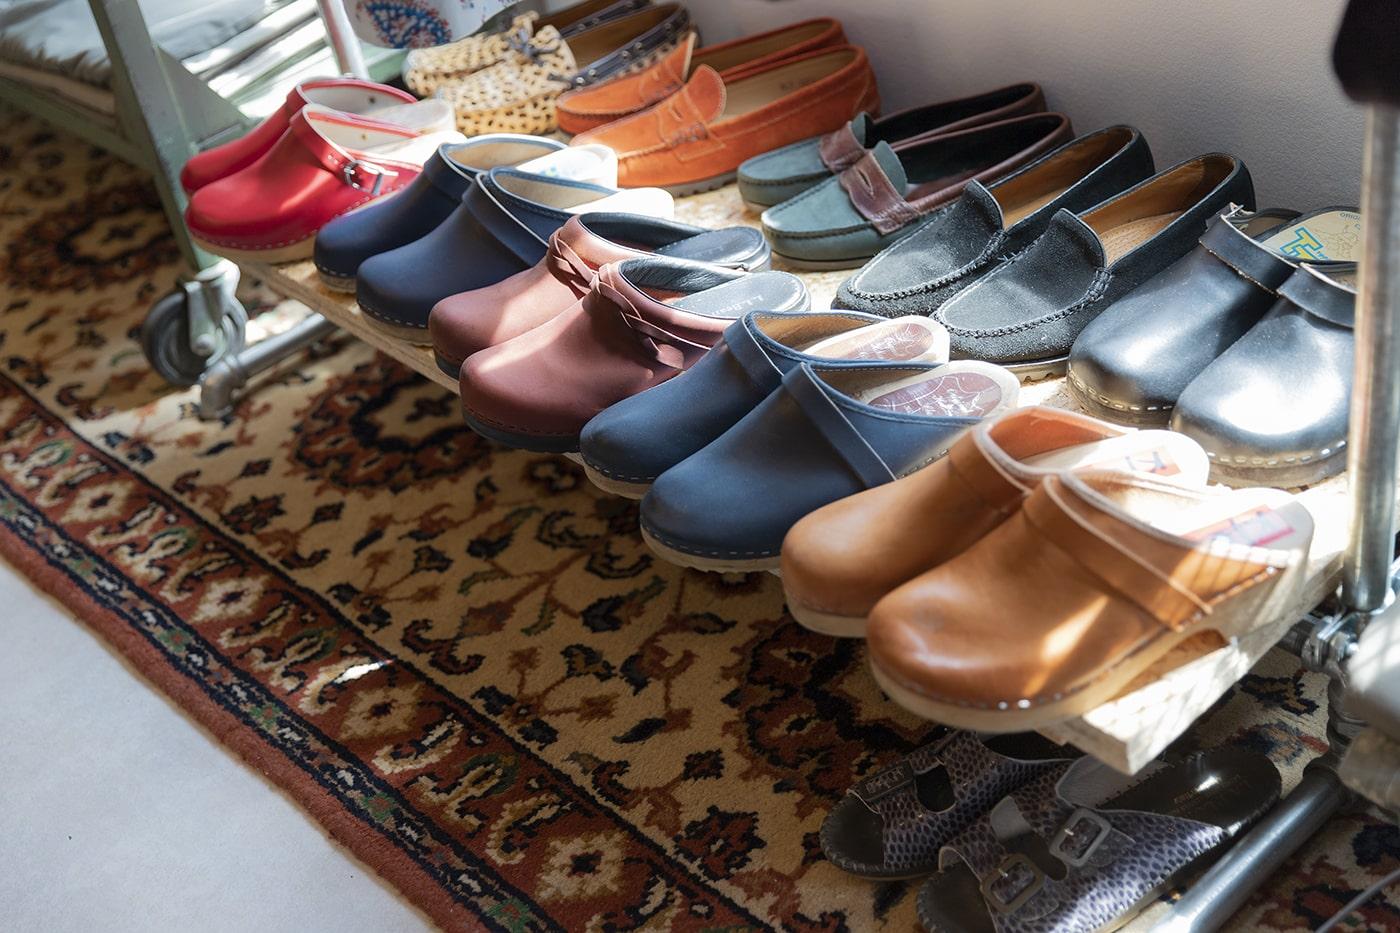 「Beagle」に並ぶ靴